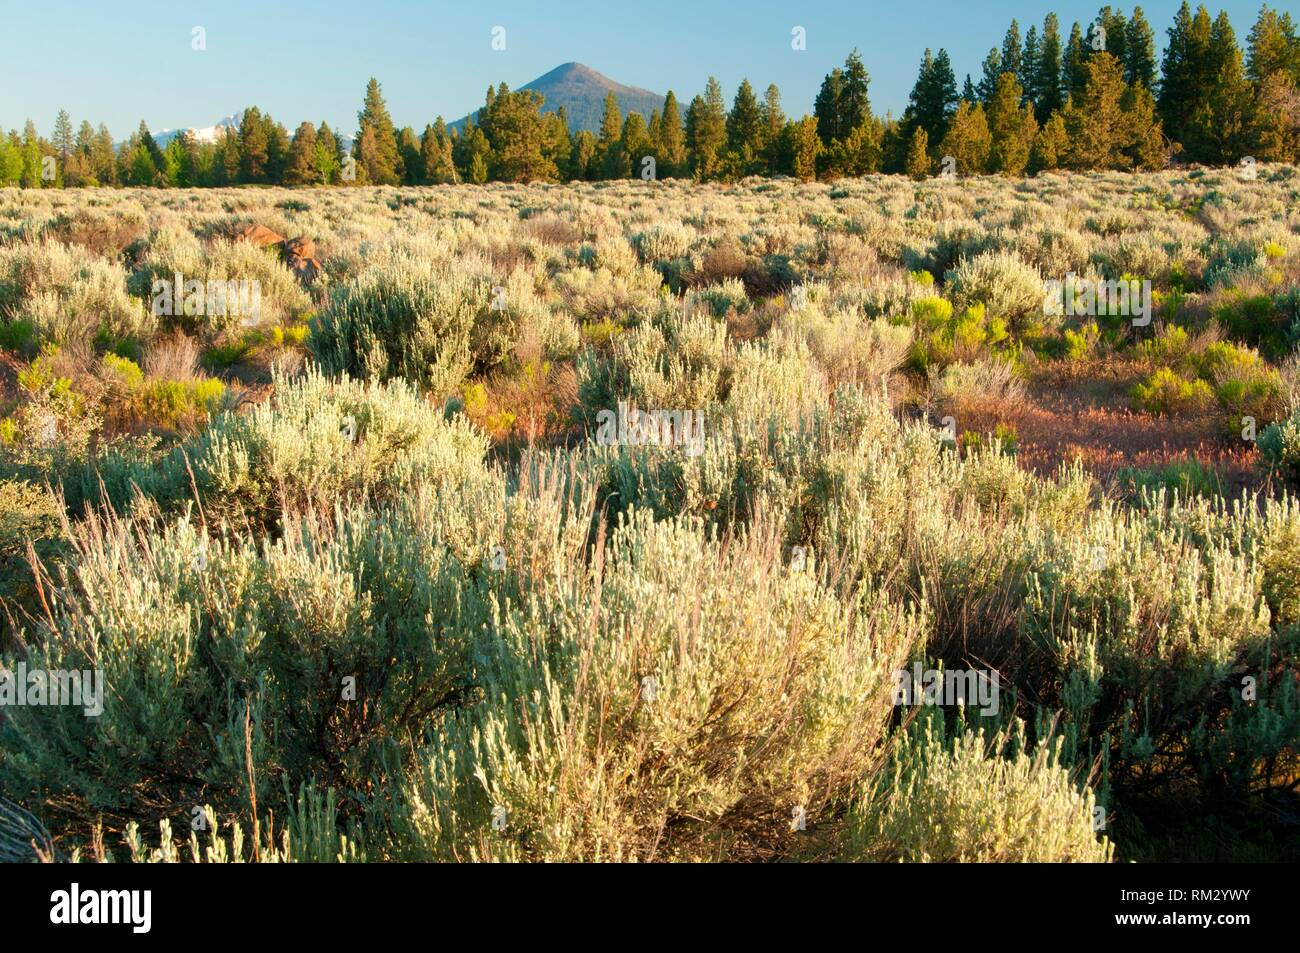 Black Butte, Deschutes County, Oregon. - Stock Image